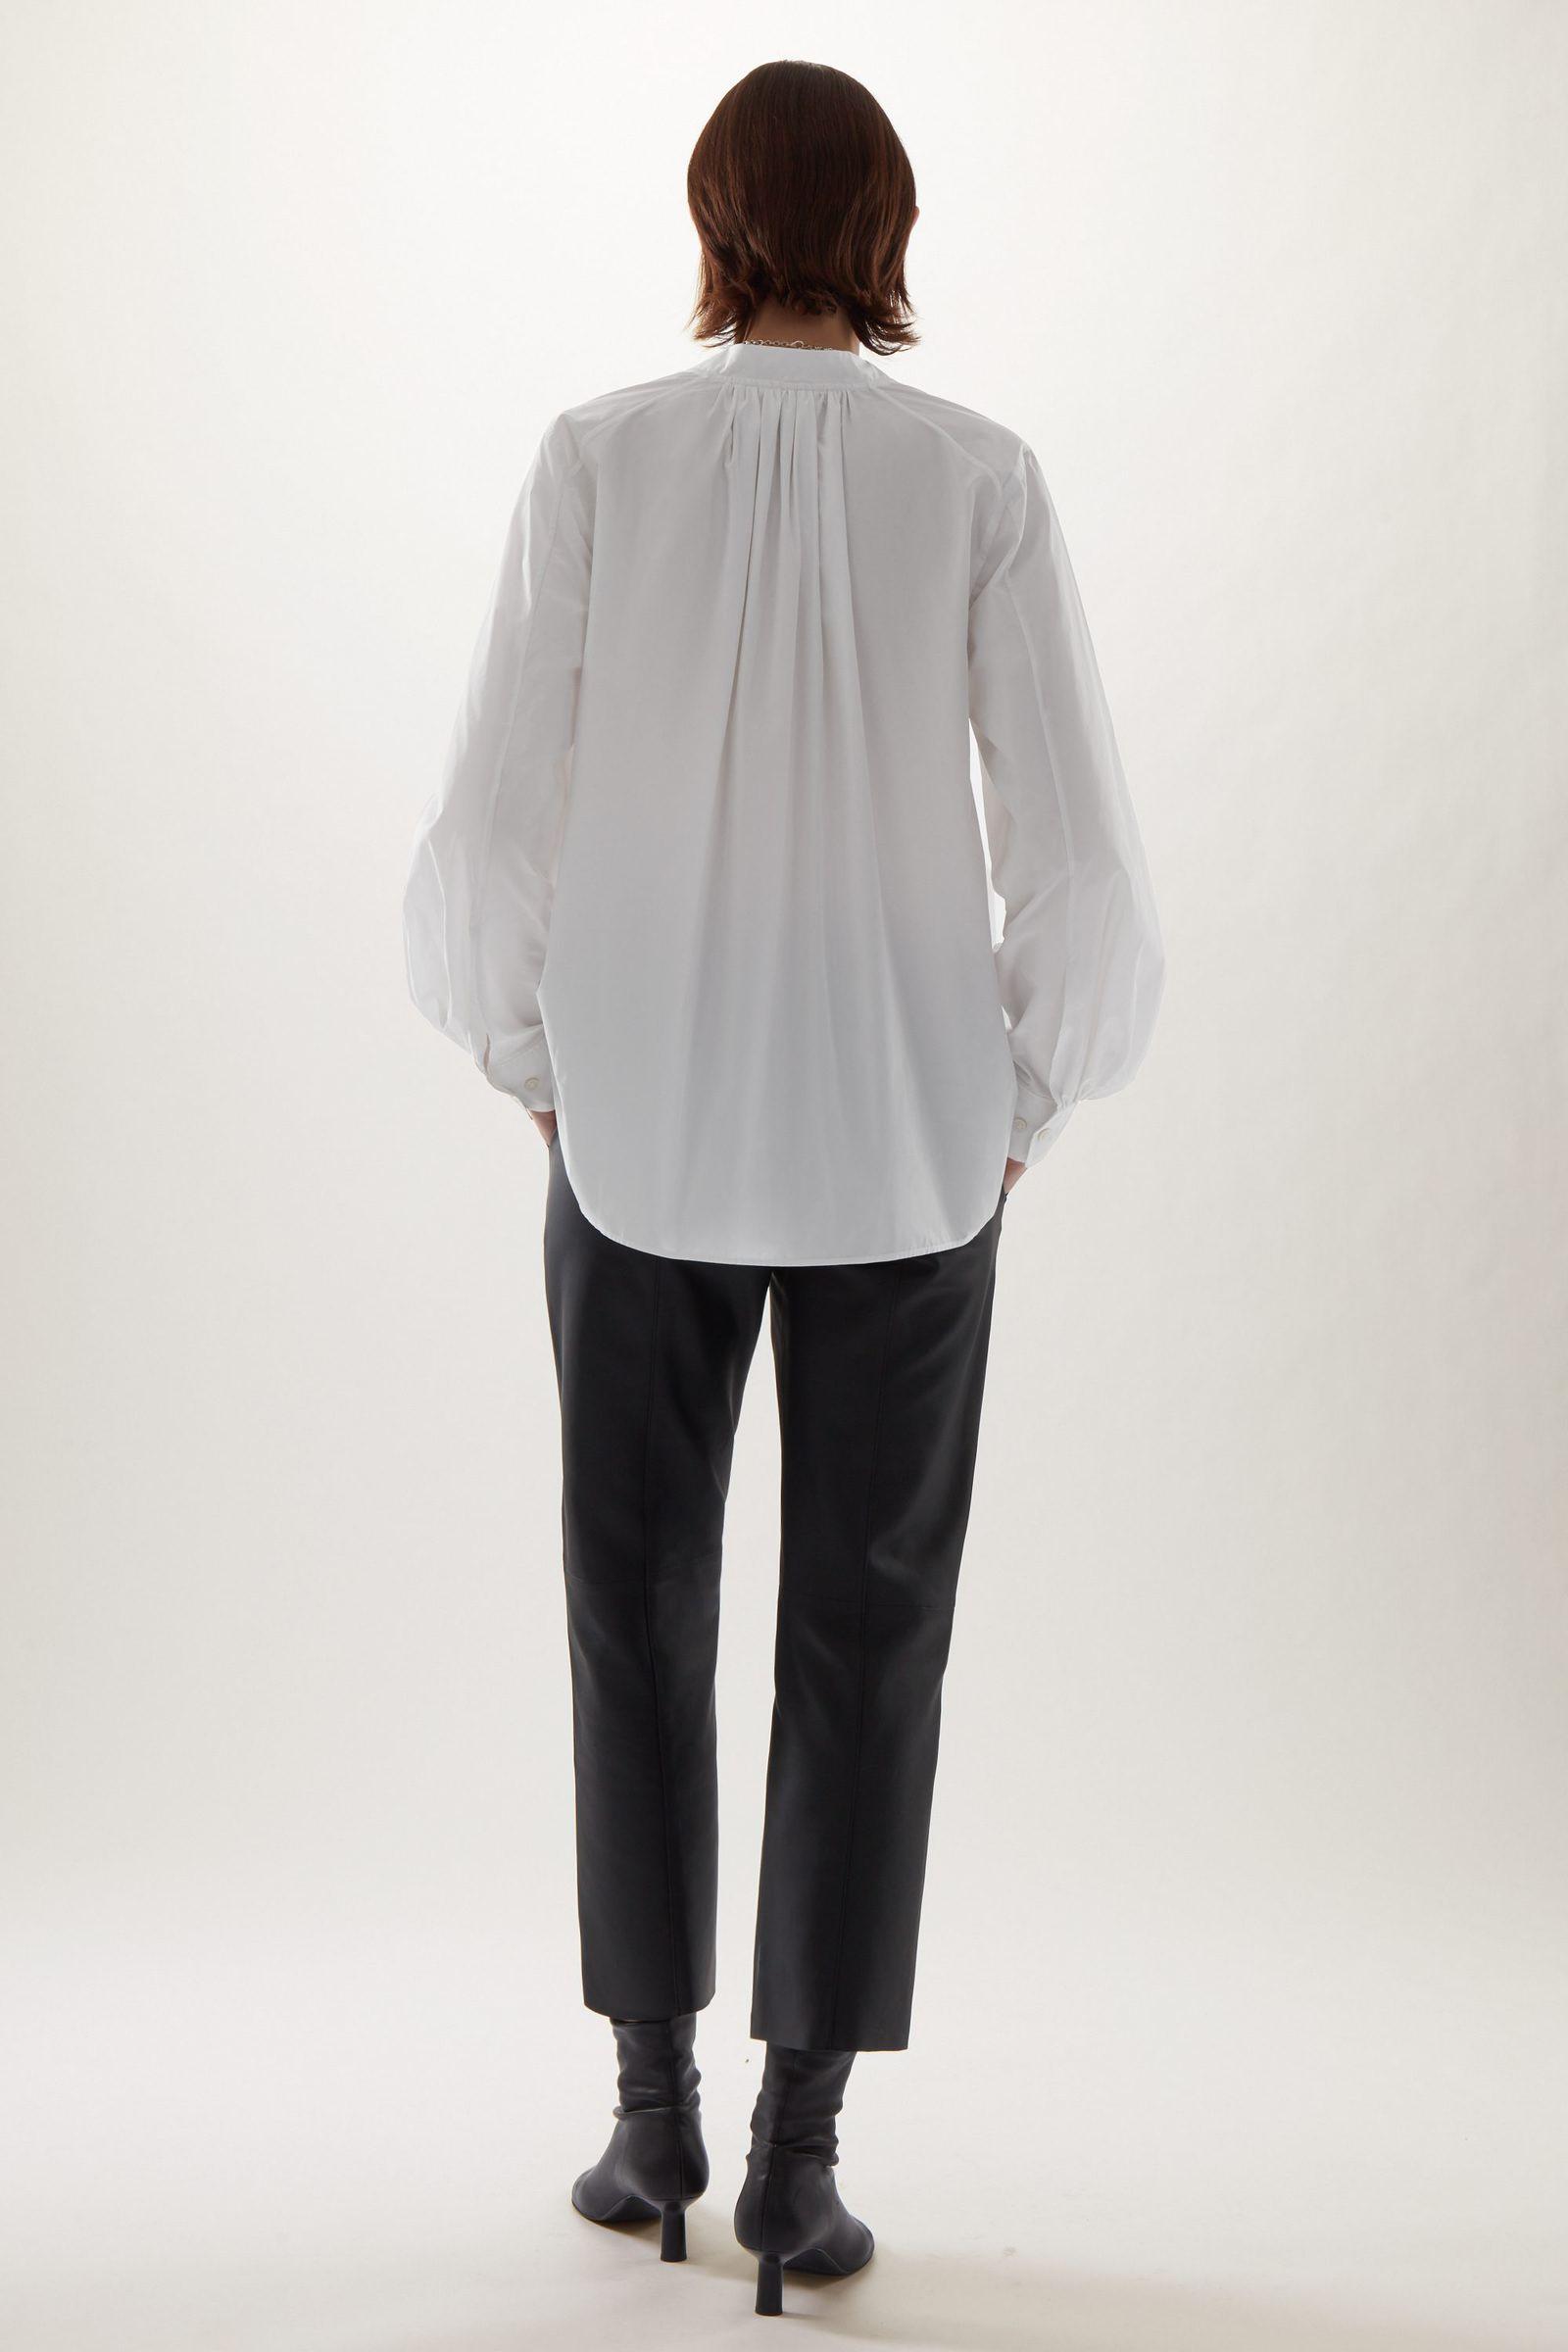 COS 리사이클 폴리에스터 V넥 A라인 셔츠의 화이트컬러 ECOMLook입니다.